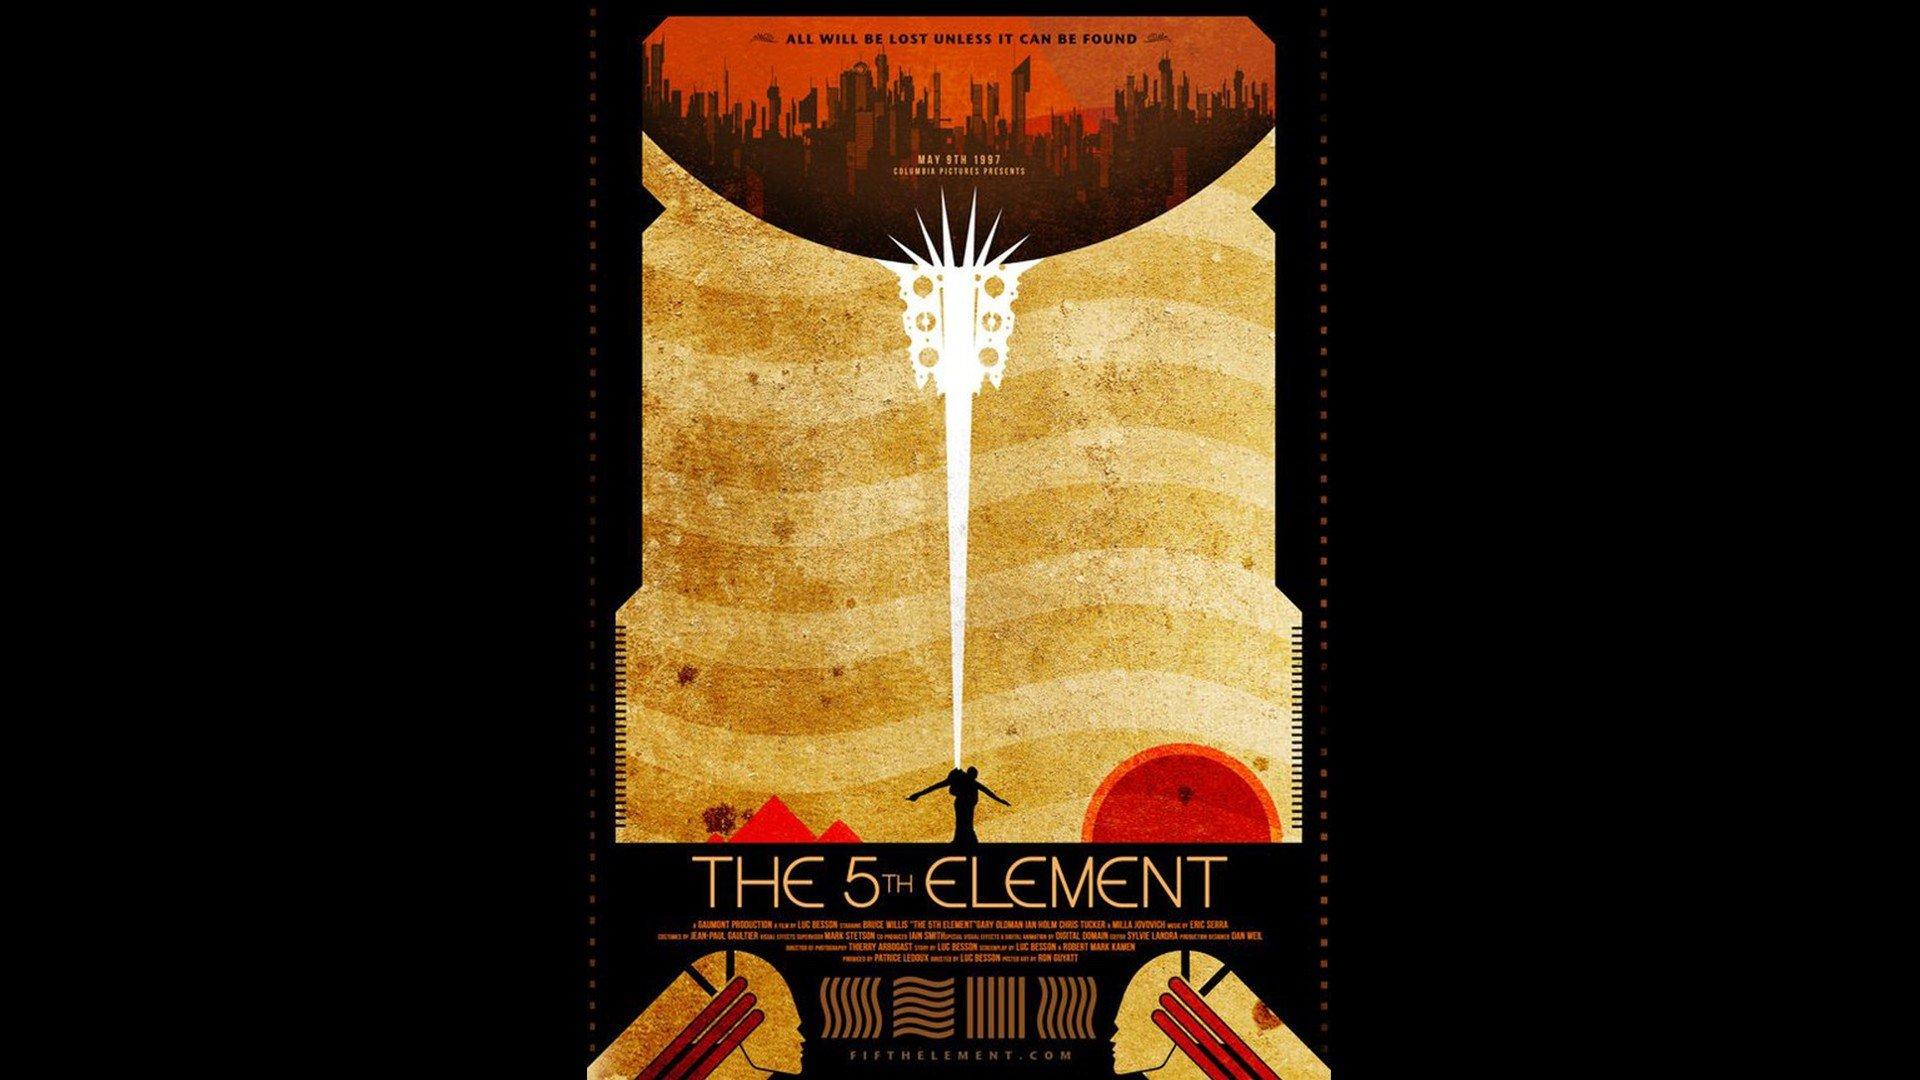 The Fifth Element Wallpaper 16   1920 X 1080 stmednet 1920x1080